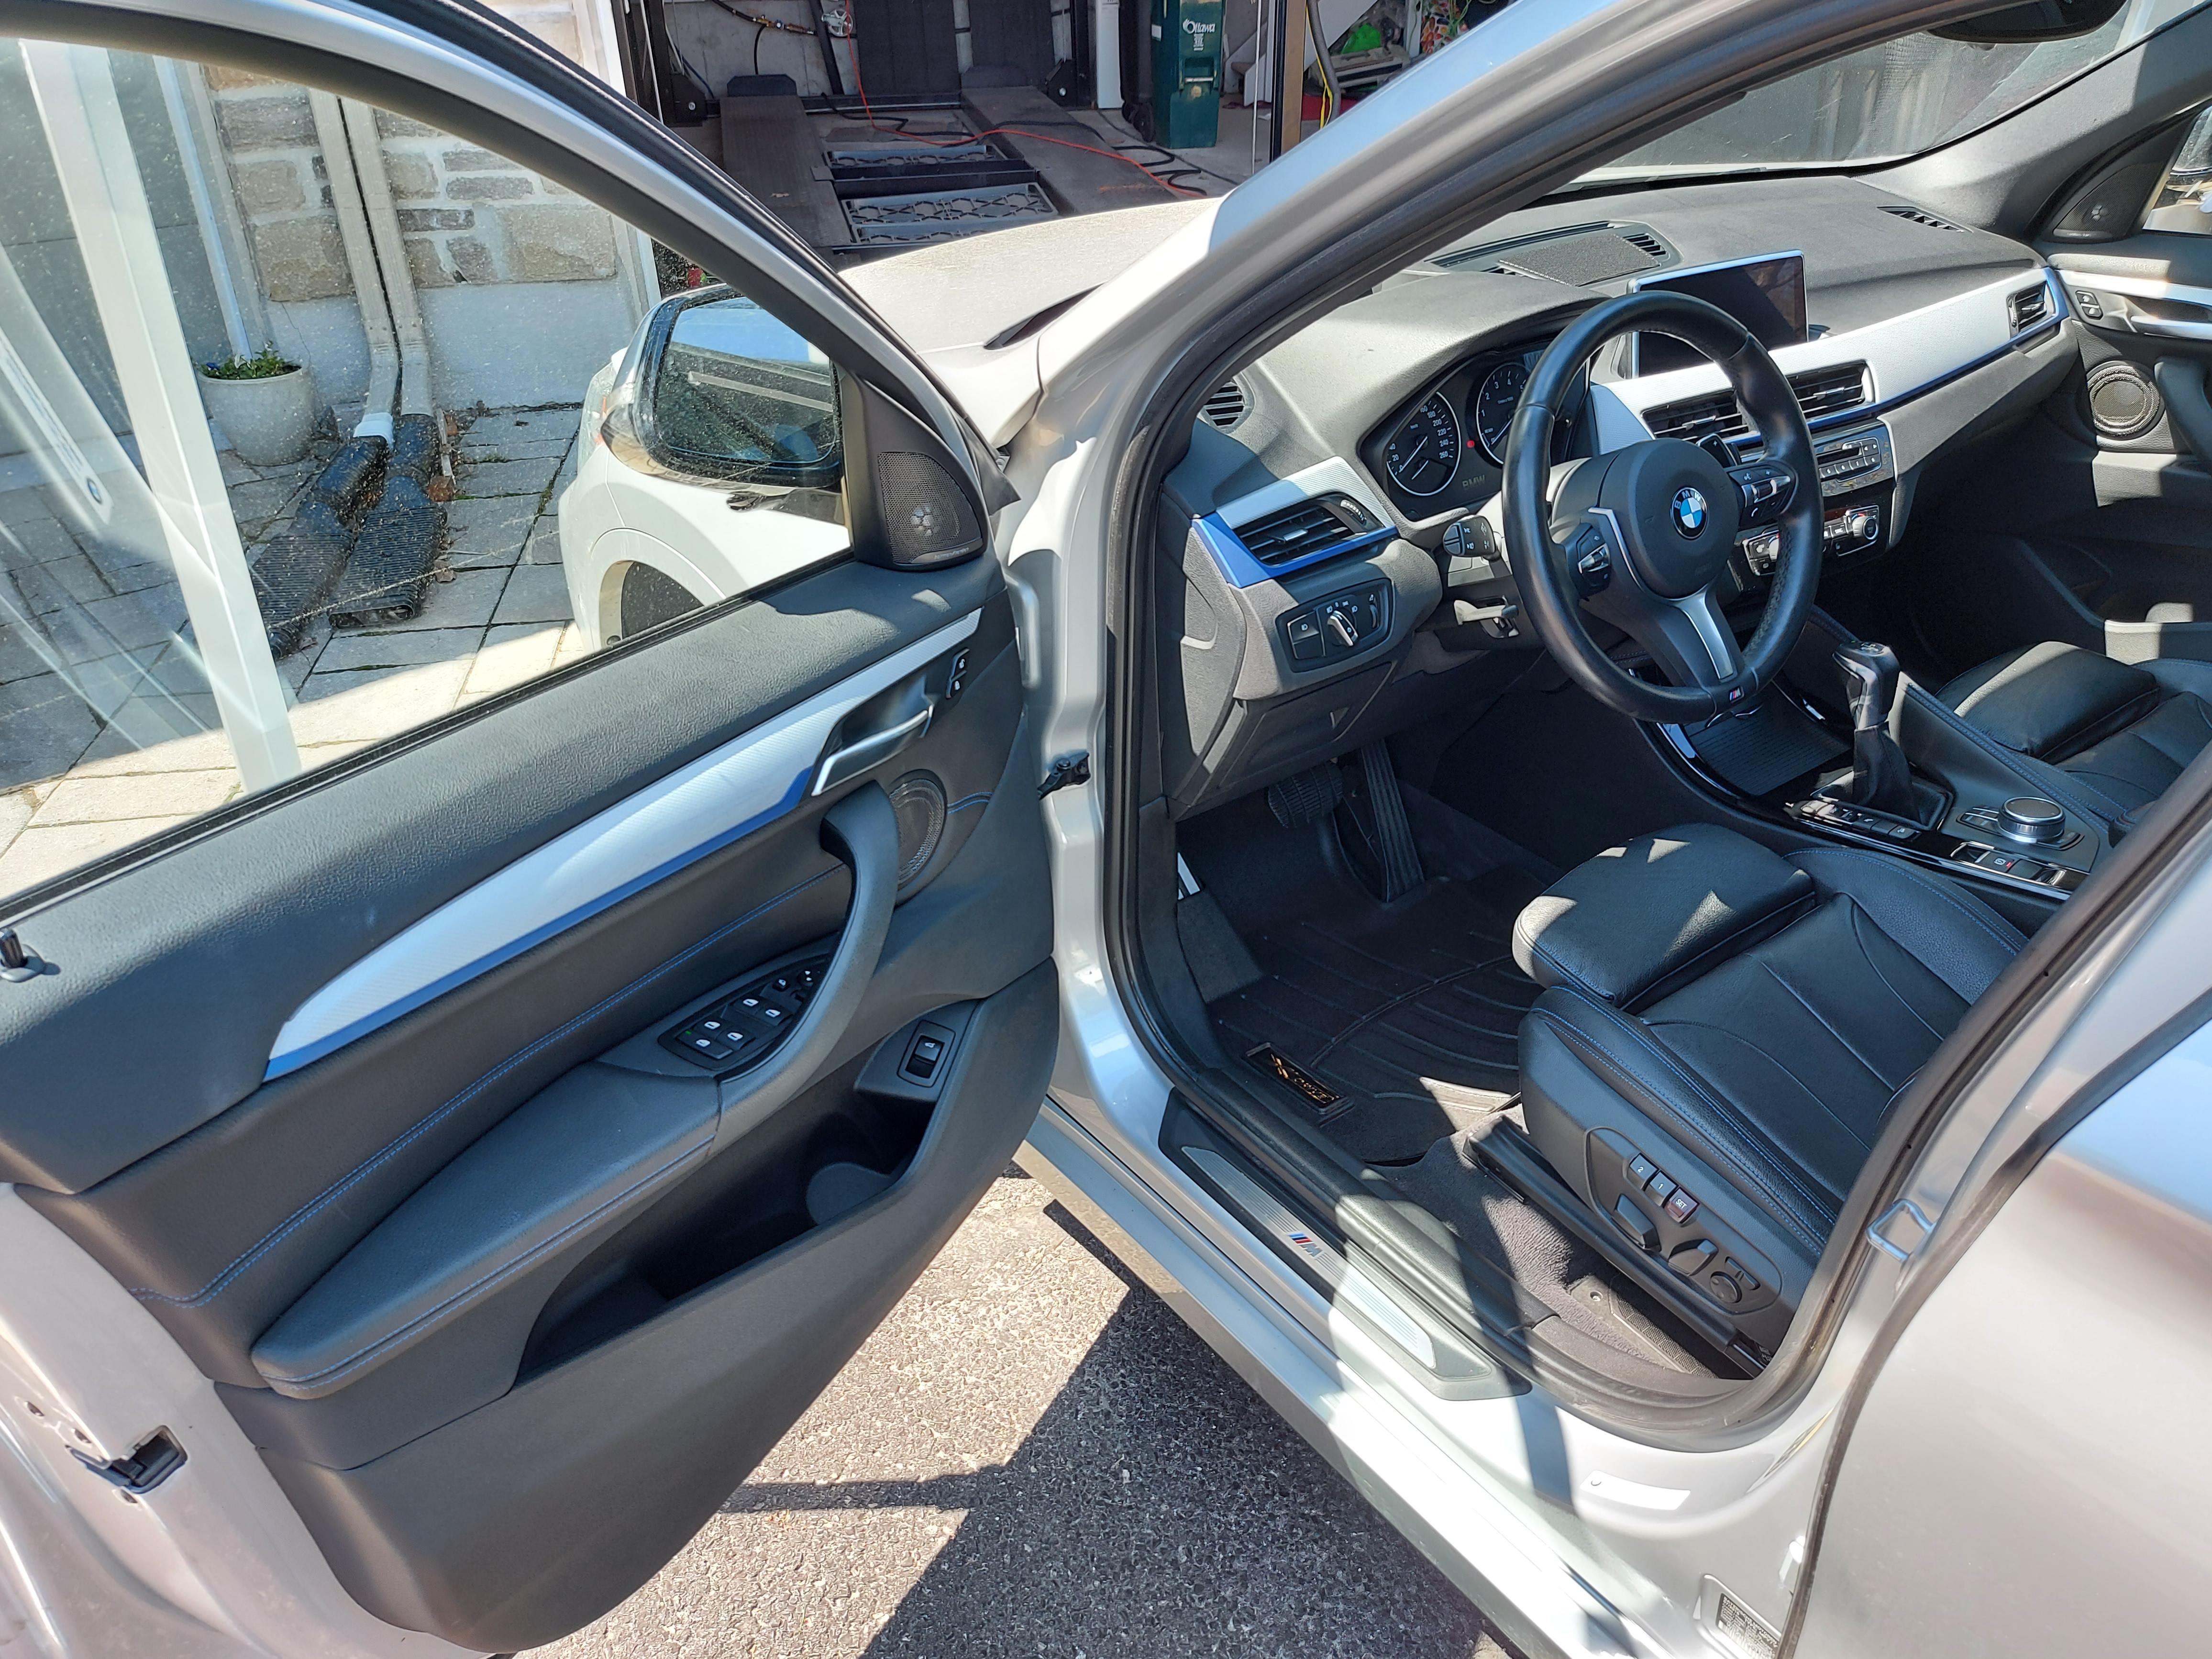 Kanata auto detailing review